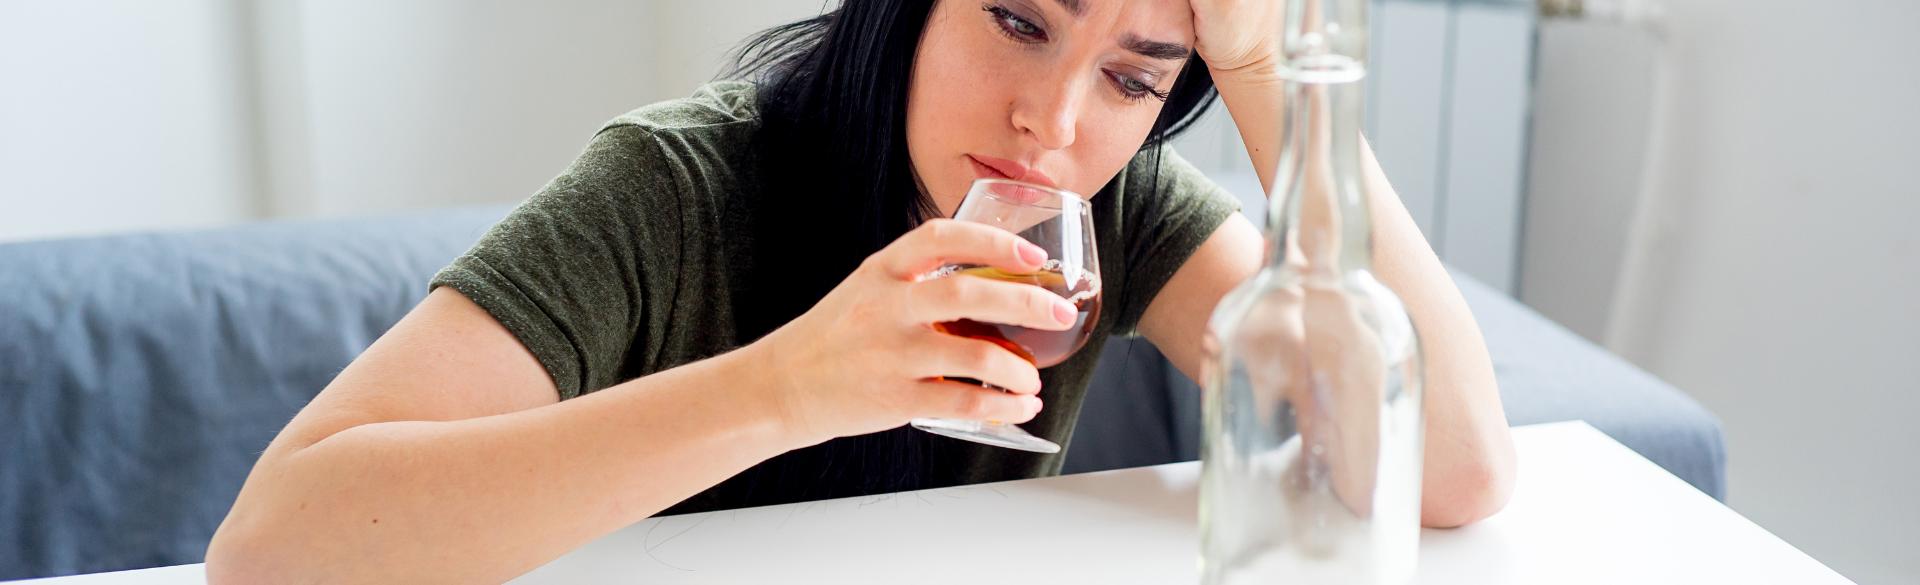 COVID-19 Alcohol Consumption and Liver Health | CU School of Medicine | Aurora, CO